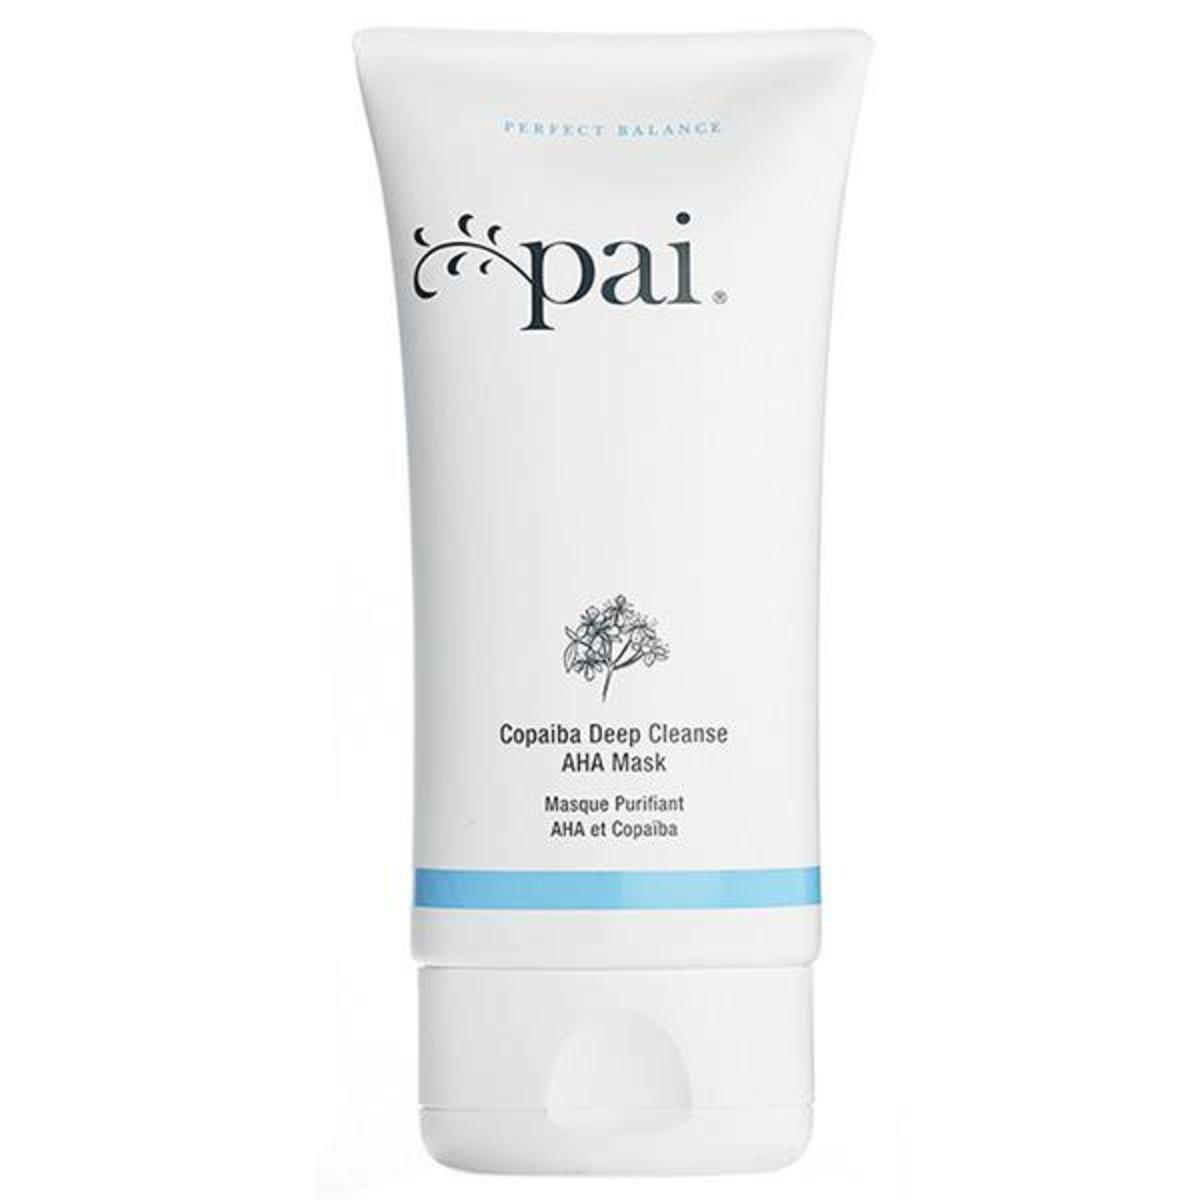 Pai Copaiba AHA Deep Cleanse Mask